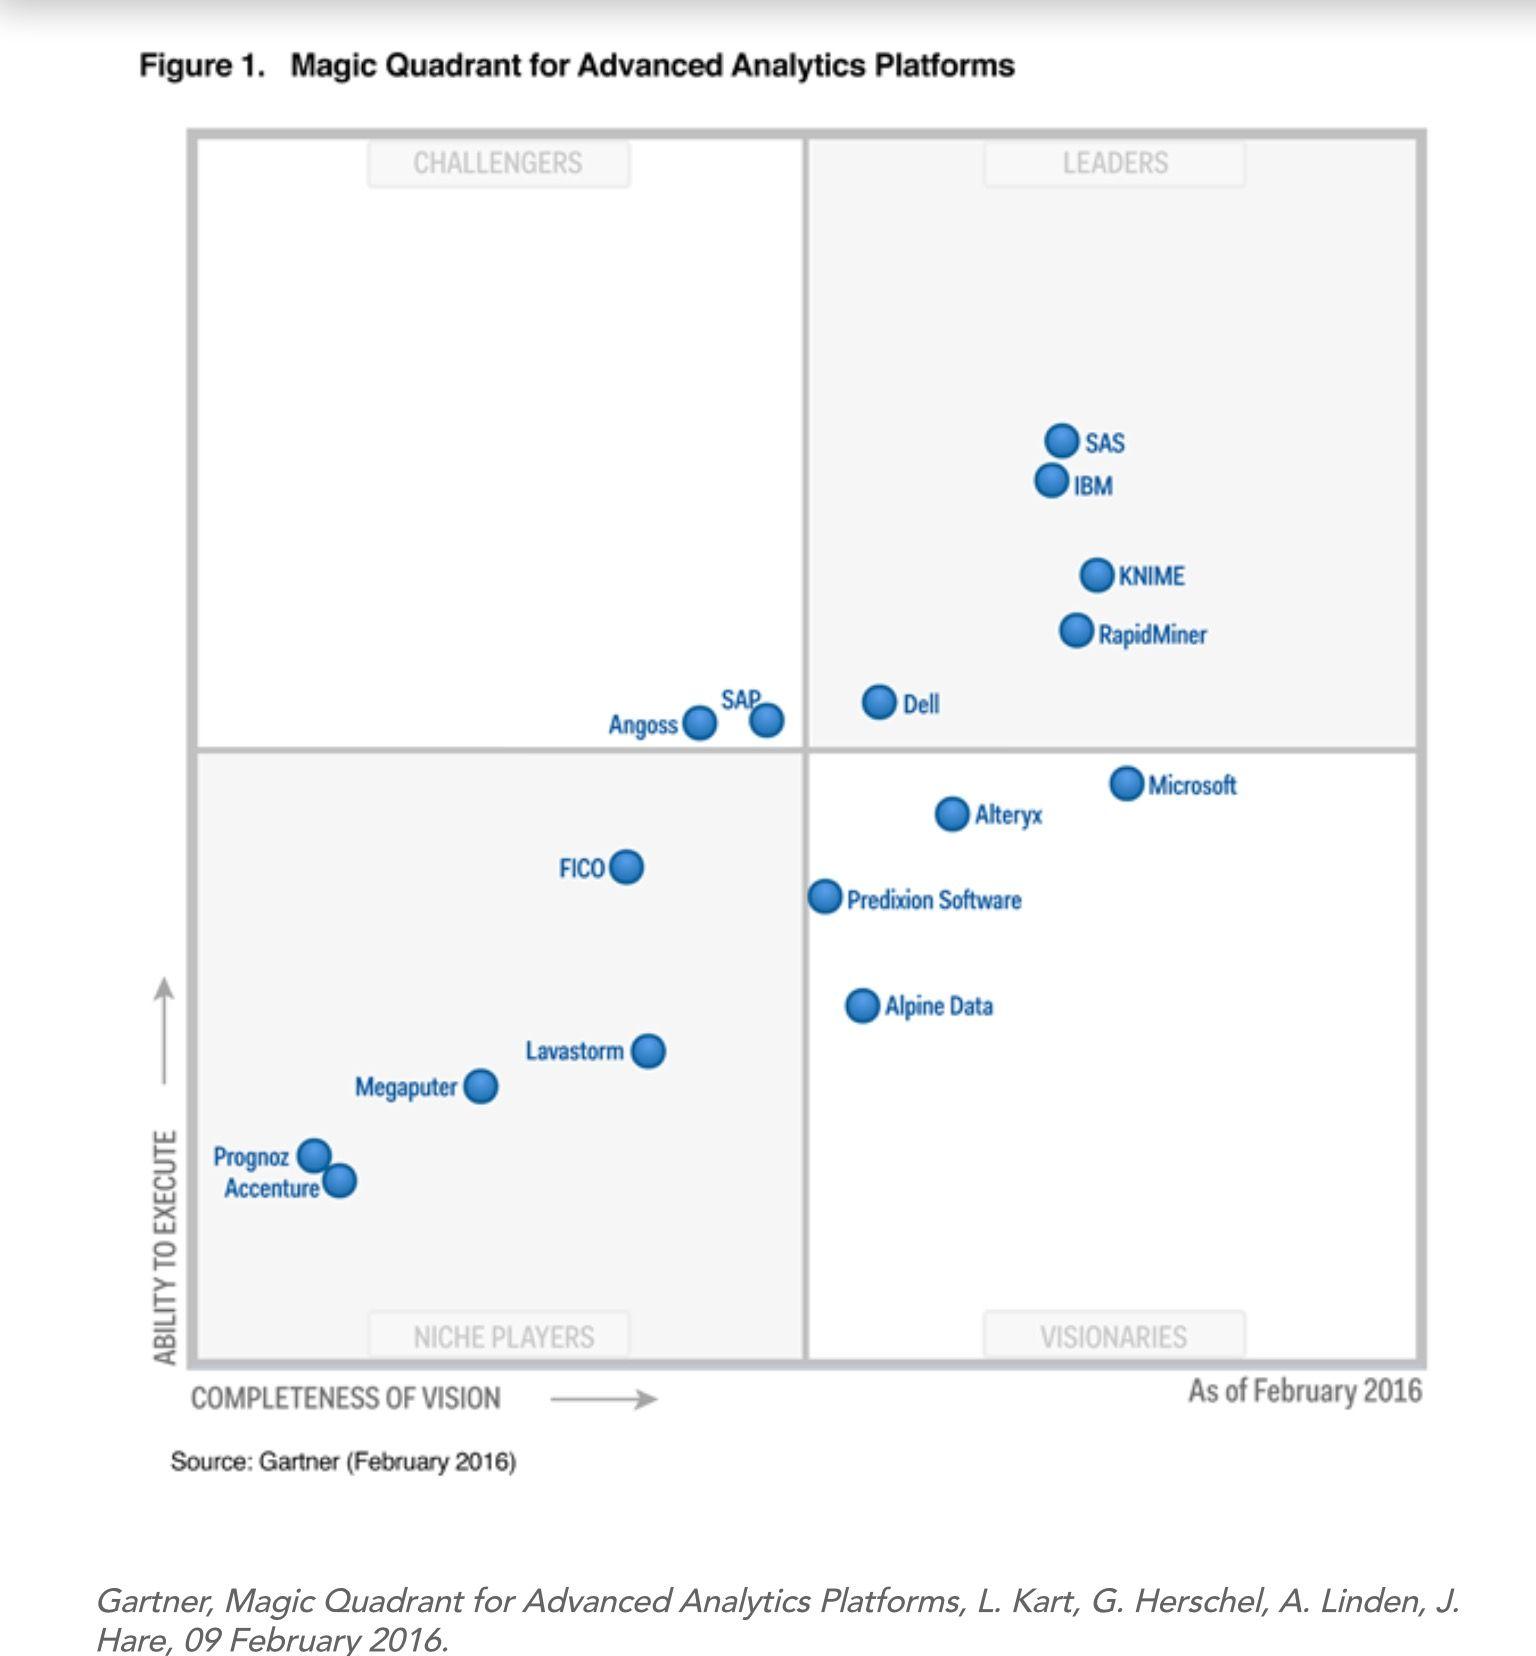 Sas Remains The Leader In The Gartner Magic Quadrant For Advanced Analytics Platforms February 2016 Data Visualization Analytics Visualisation